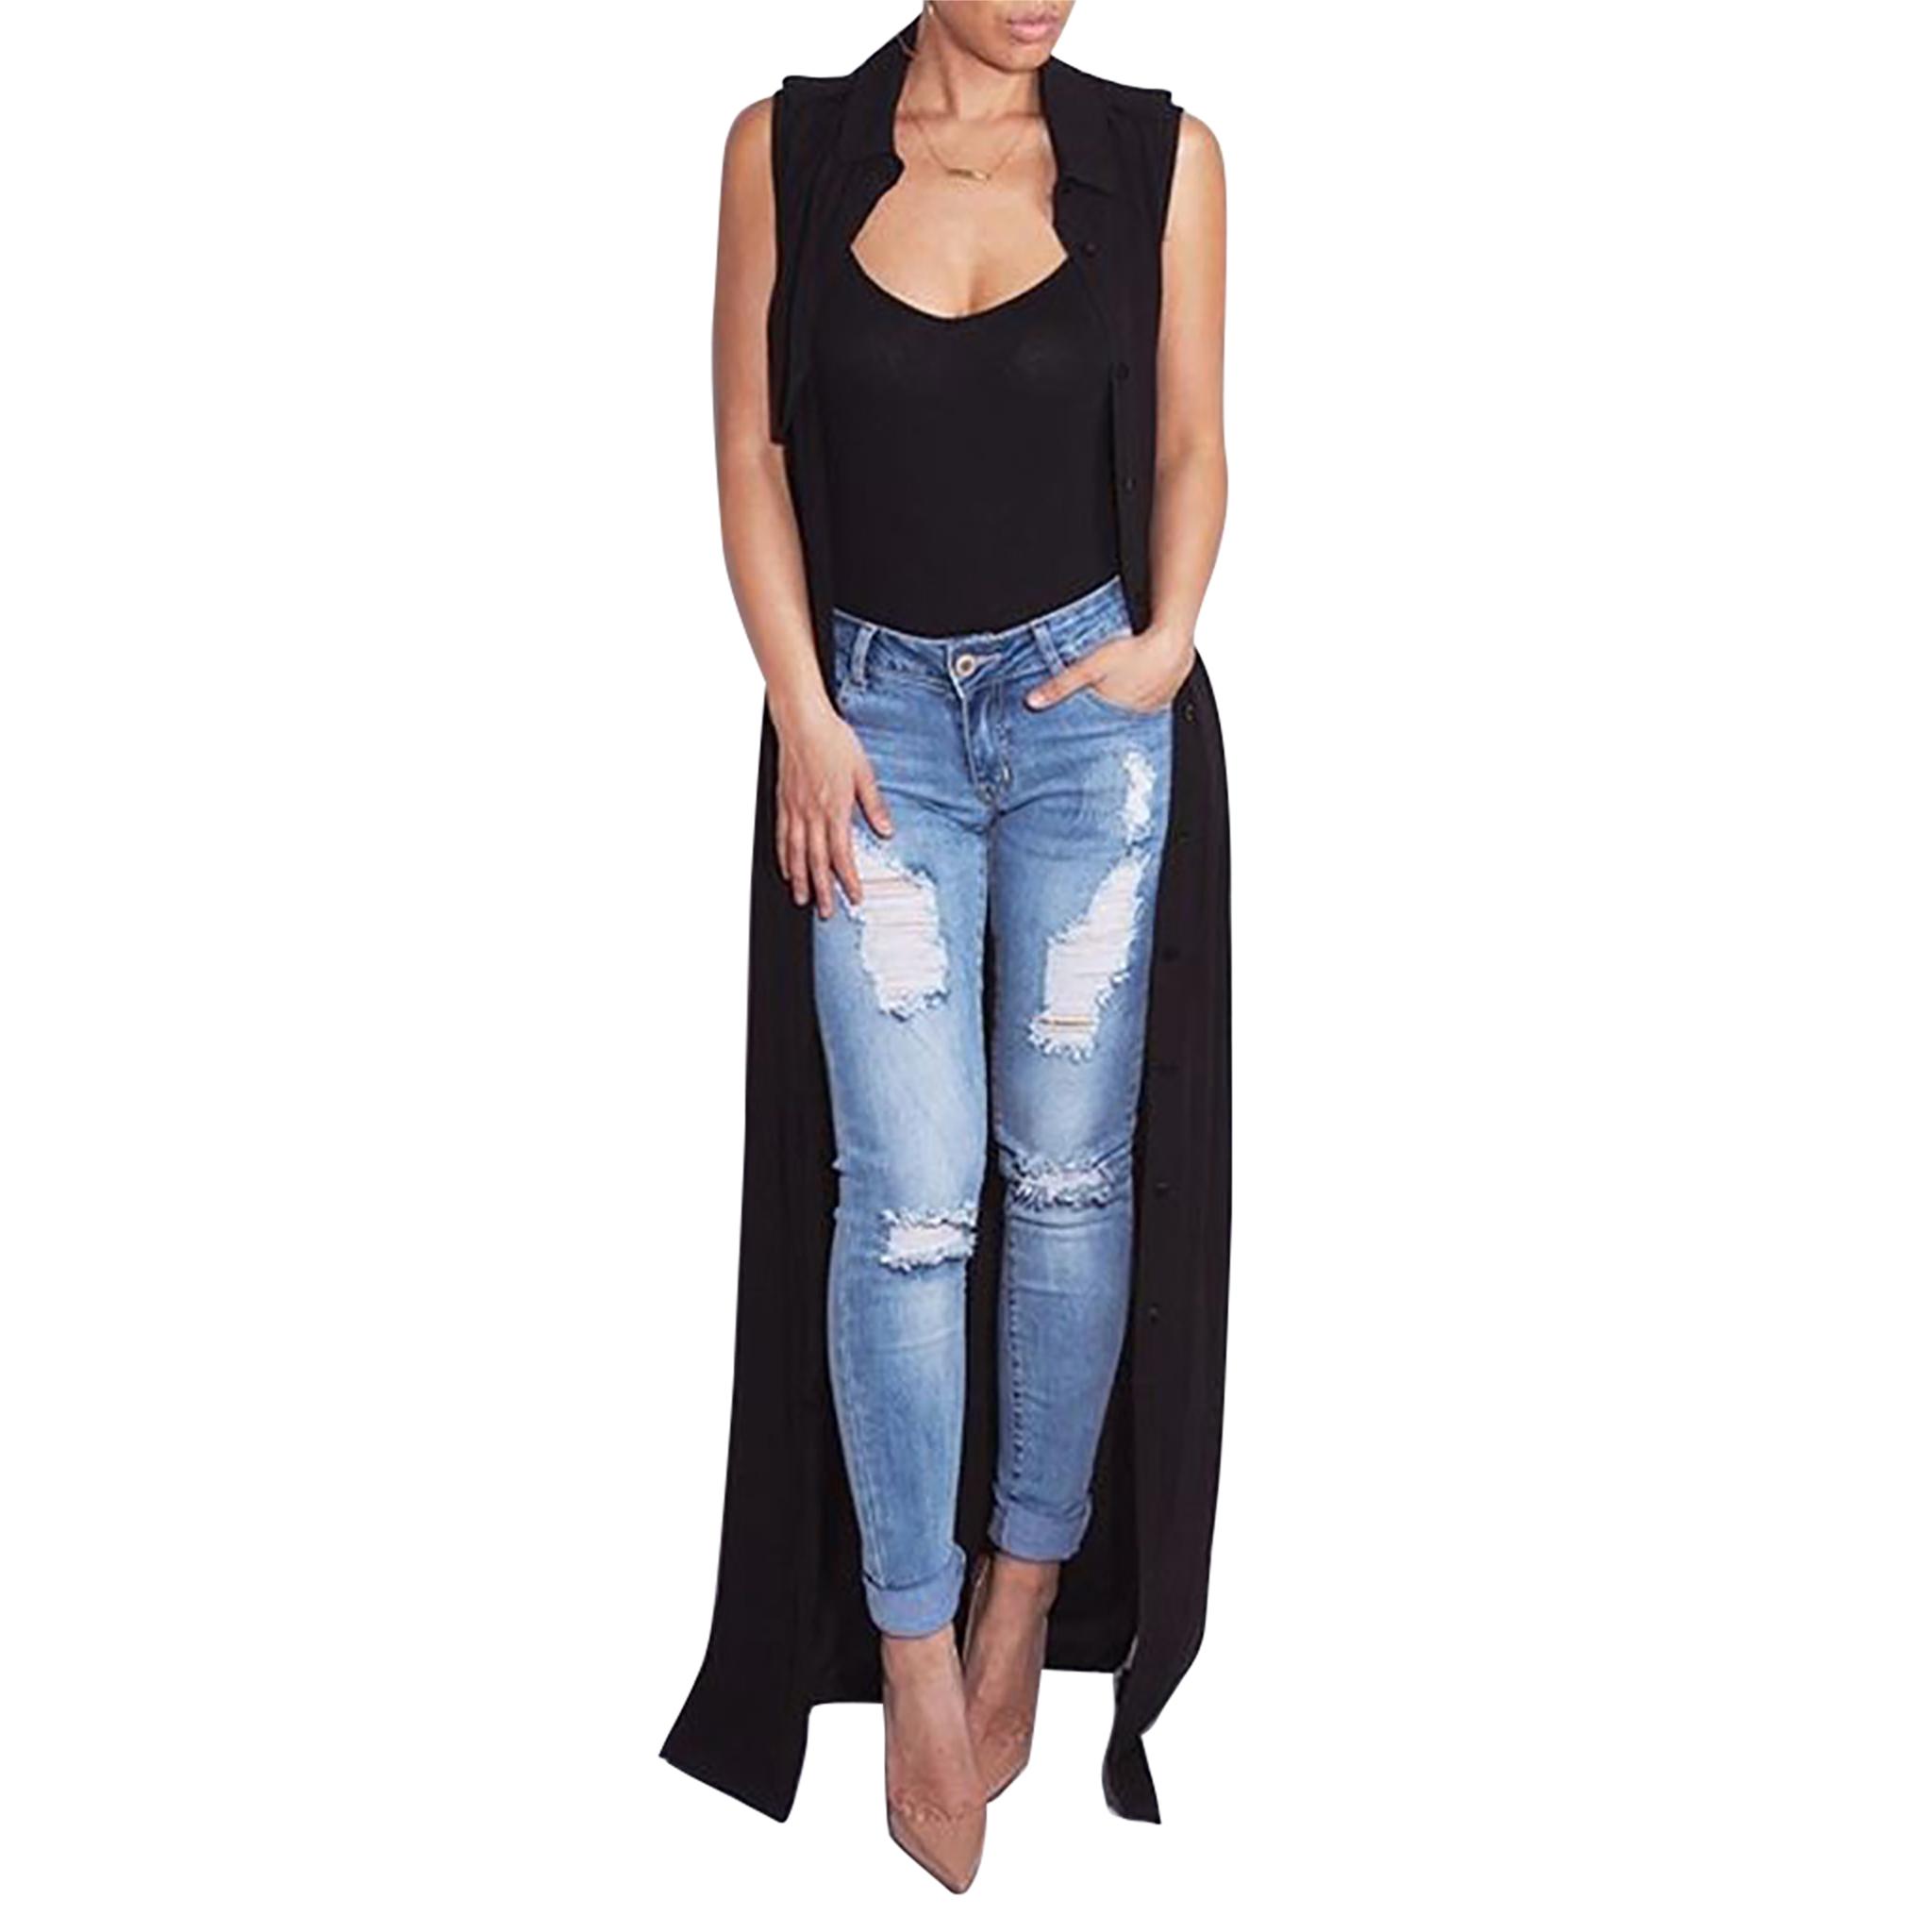 Chiffon Women Cardigan Blouses Casual Summer Turn-down Sleeveless Maxi Long Blouse Silk Shirt Cover Up Sashes C19040402